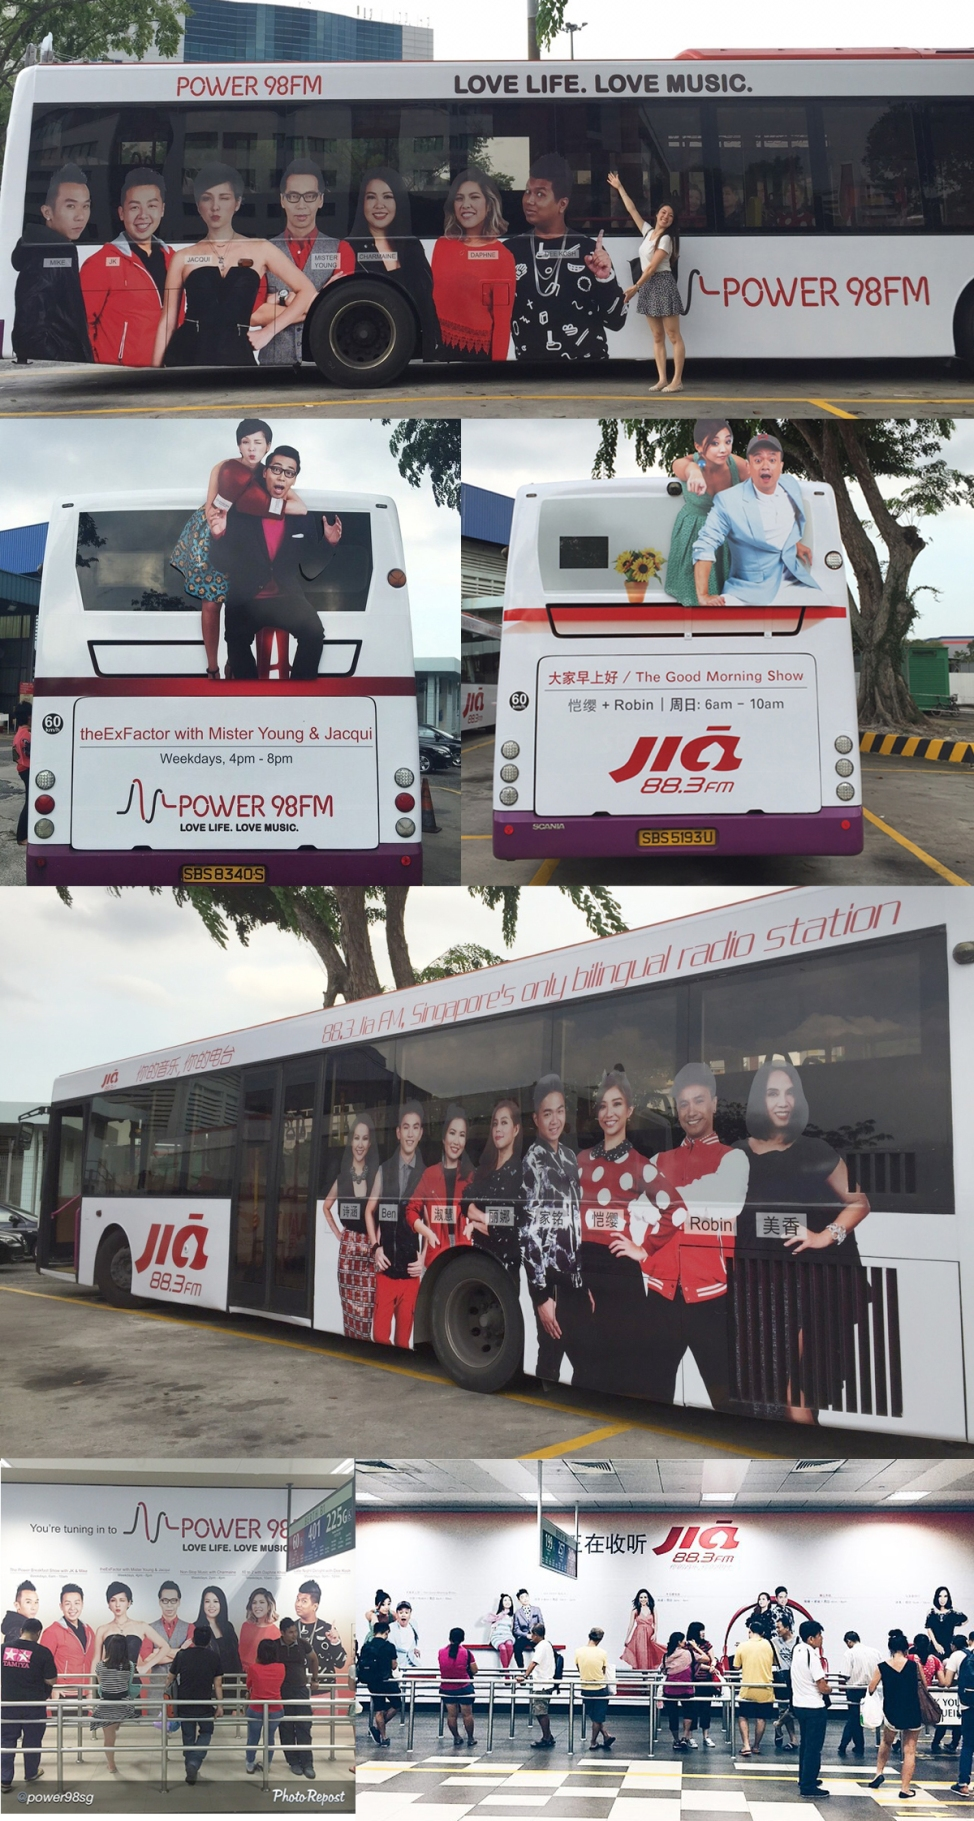 Bus Ads and Billboards. Fujifilm X-Trans Rocks!